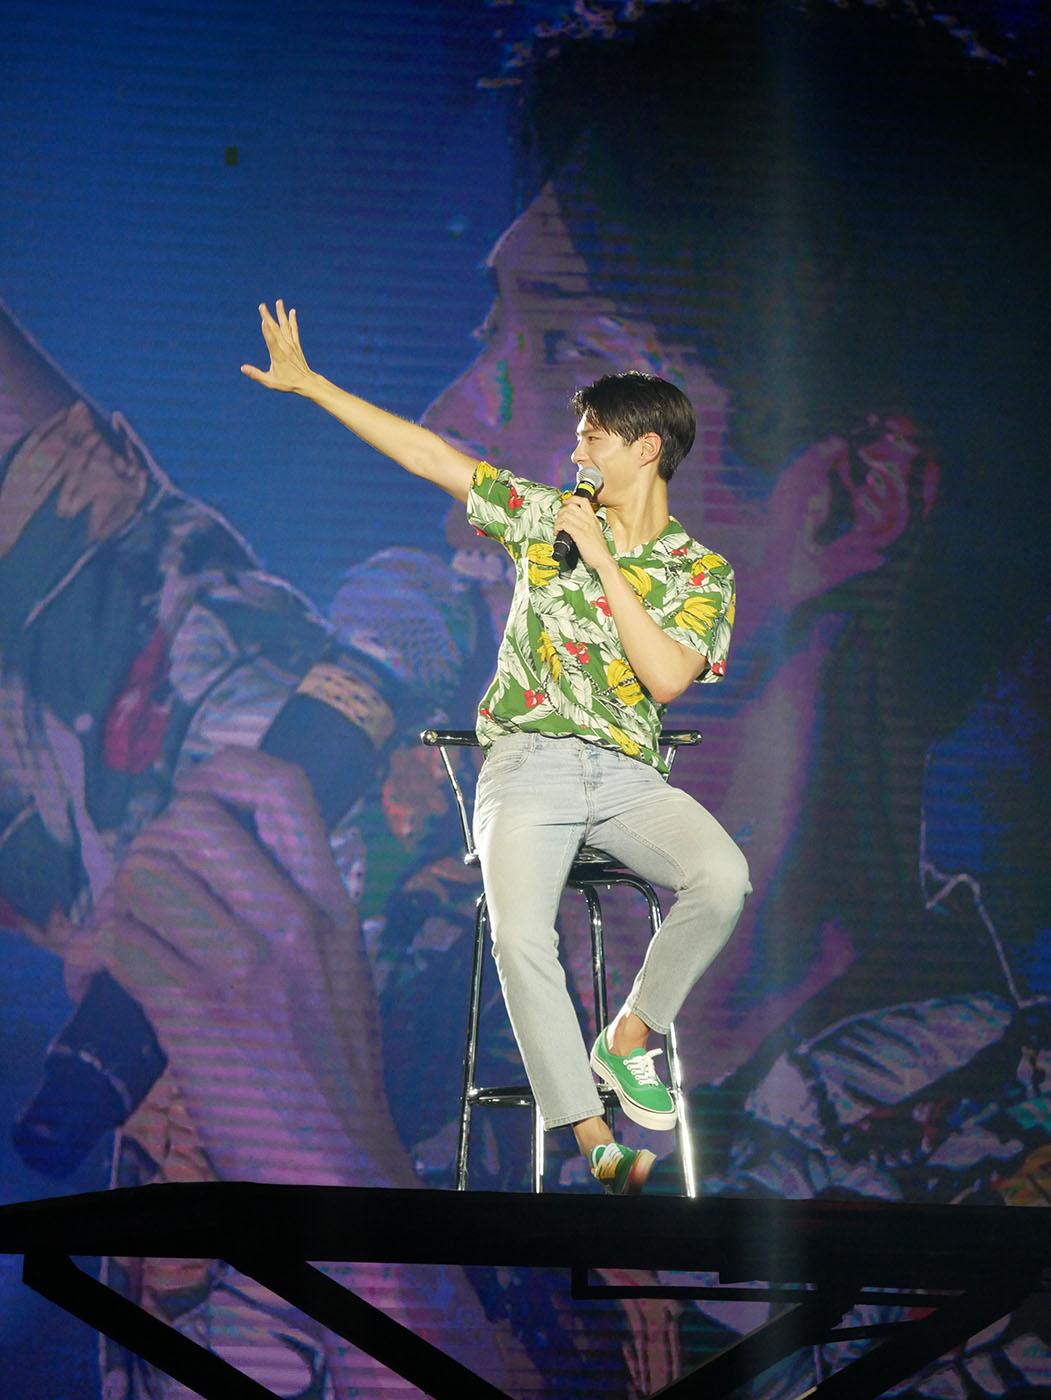 A wave of his hand sends Park Bo-gum's fans screaming u0022Saranghae! (I love you!)u0022. Photo by Nikko Dizon/Rappler